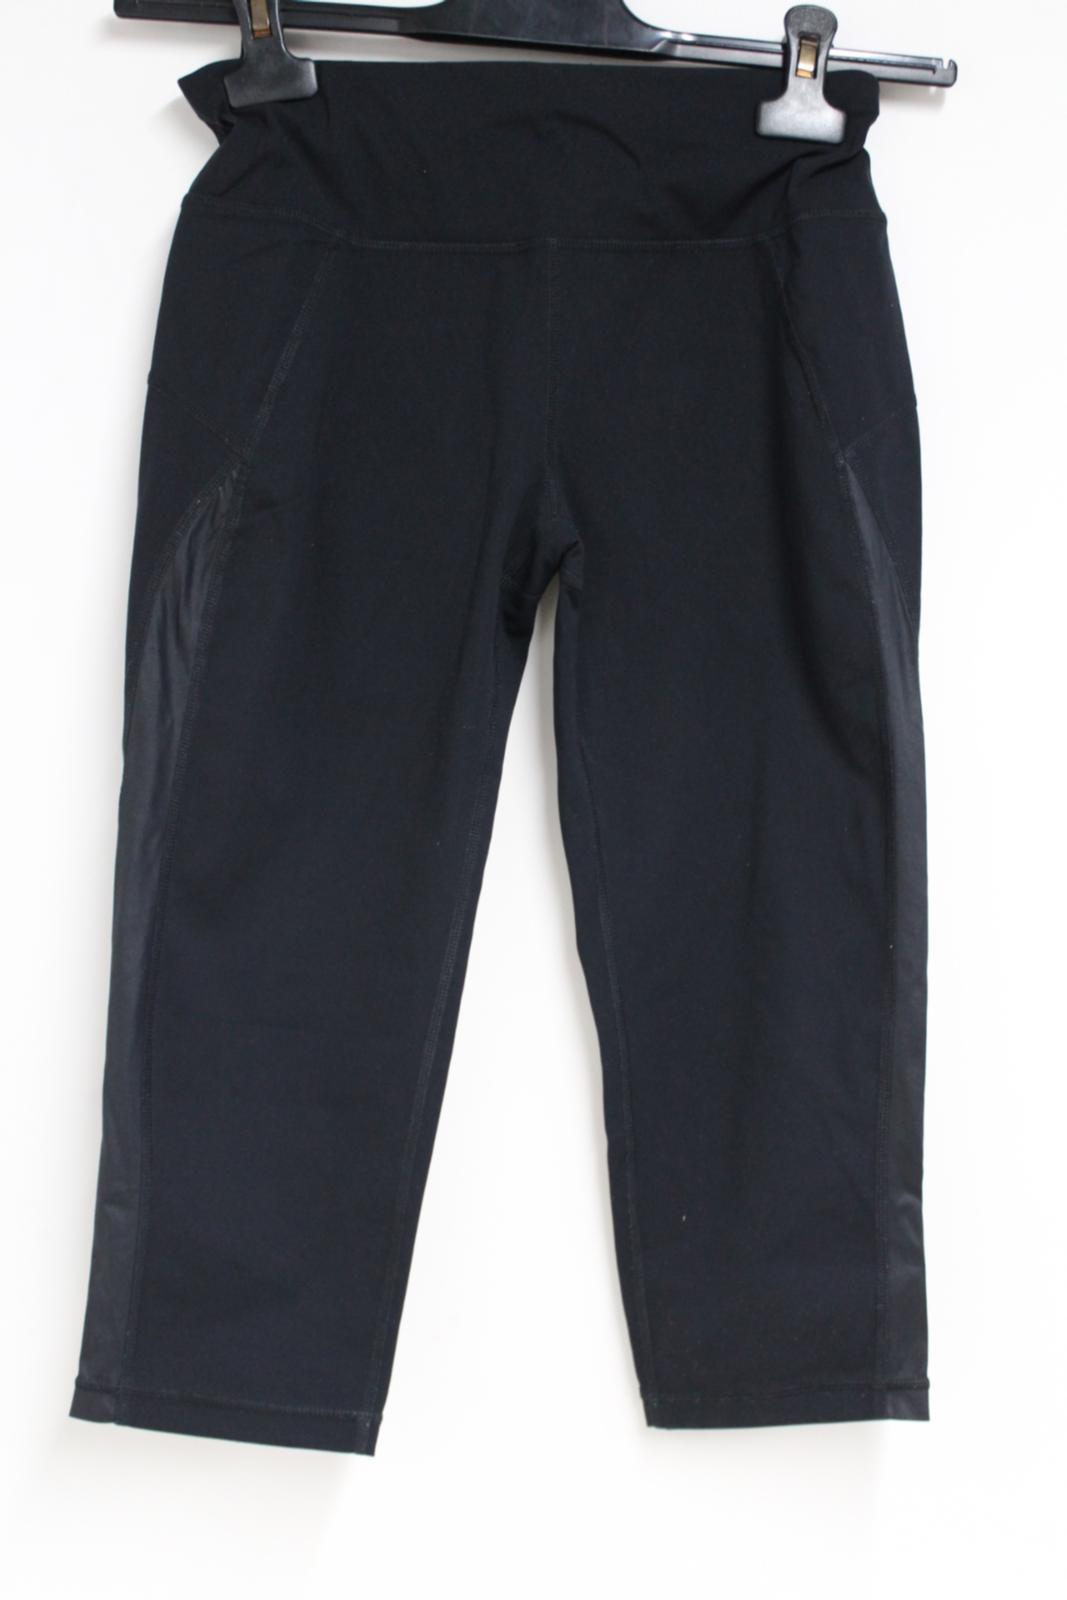 Sweaty-Betty-Ladies-Negro-3-4-piernas-Corto-Leggings-Activewear-pequeno-W26-L16 miniatura 10